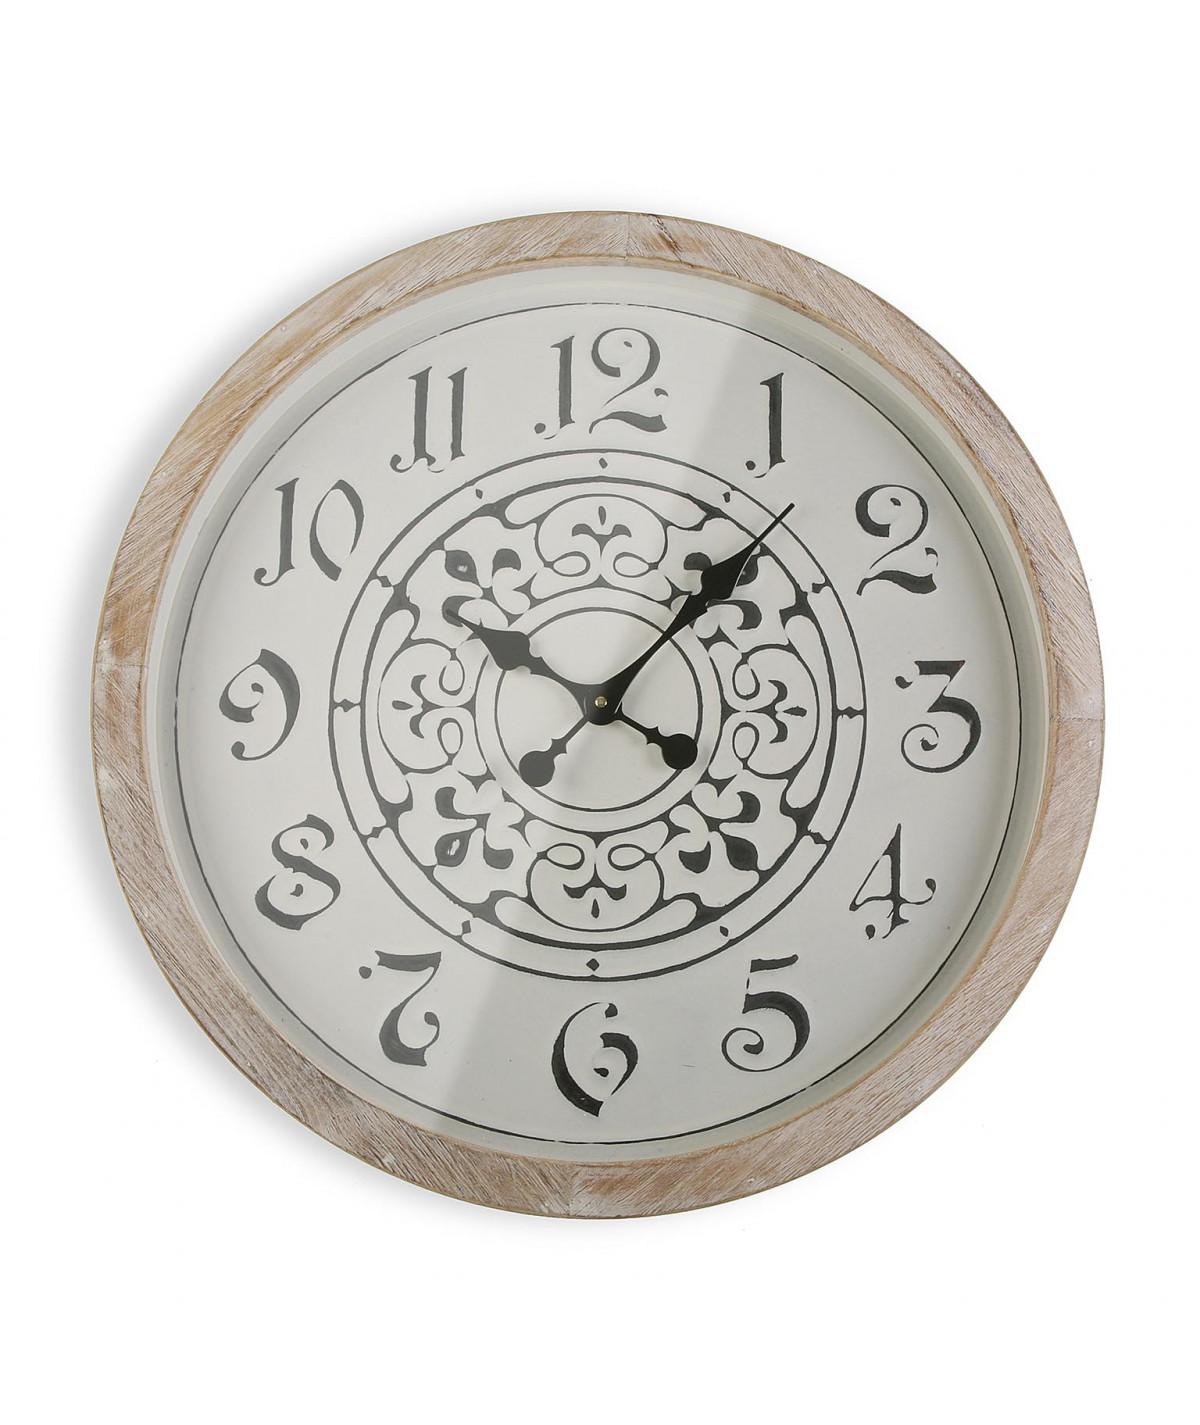 Horloge murale motif arabesque Diam63cm - Jasmine - Horloge murale|Yesdeko